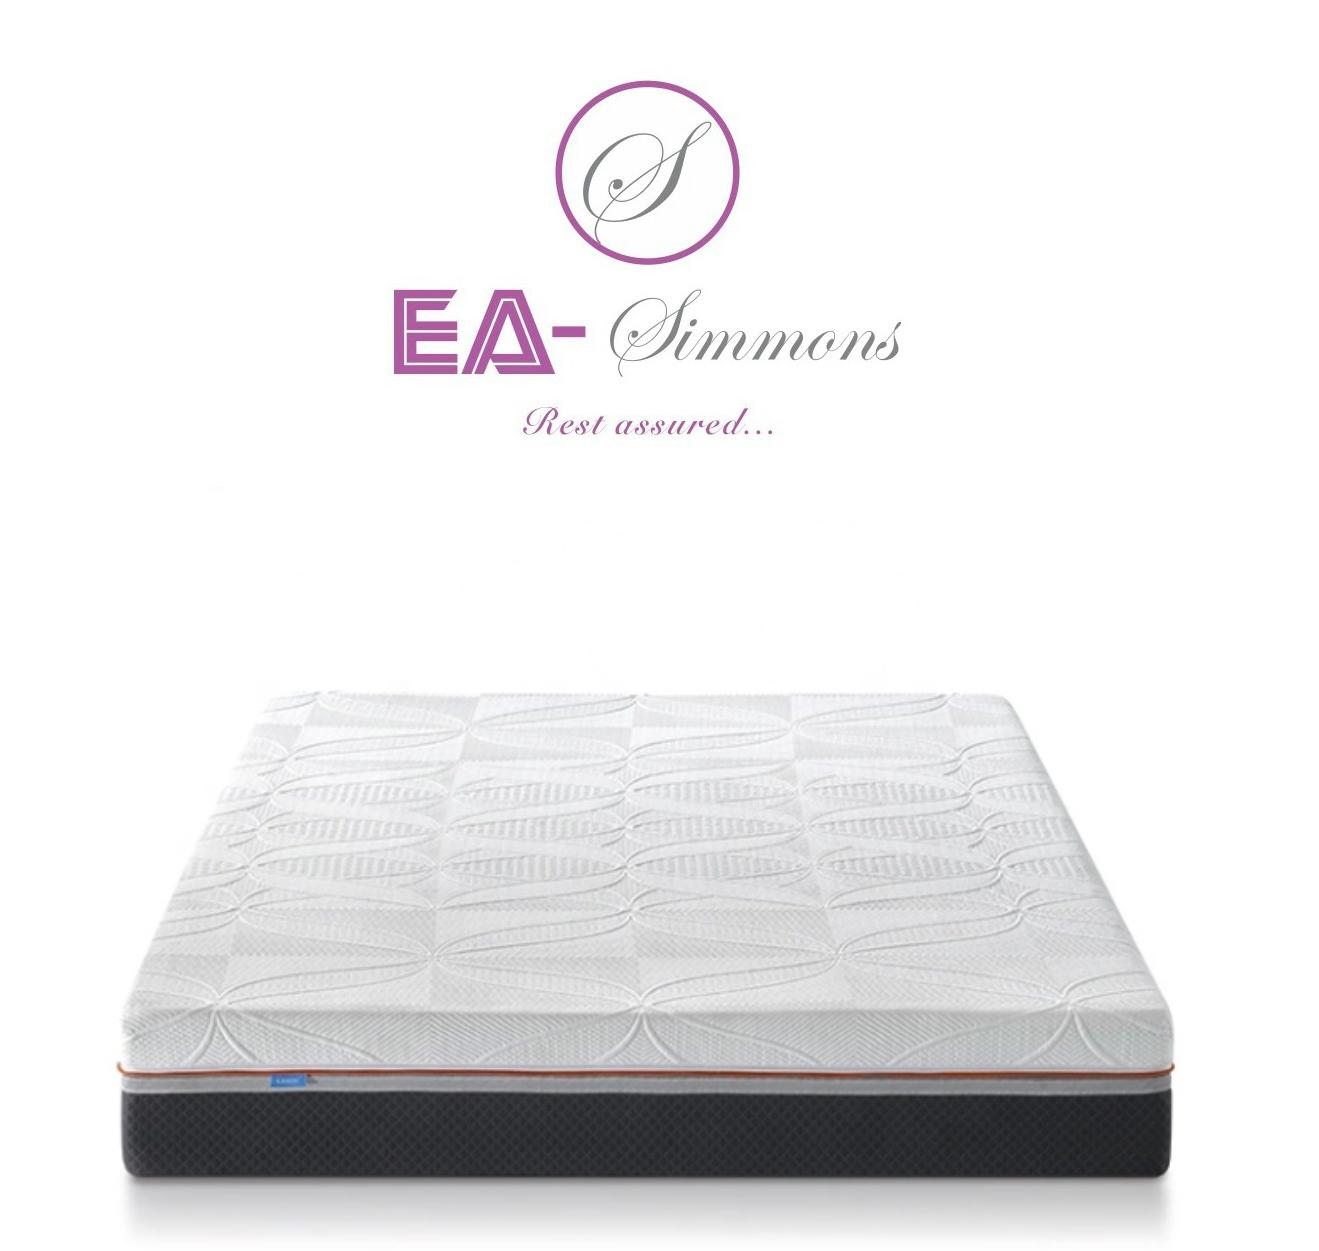 EA-Simmons Cloud Sensation (Hybrid) Mattress